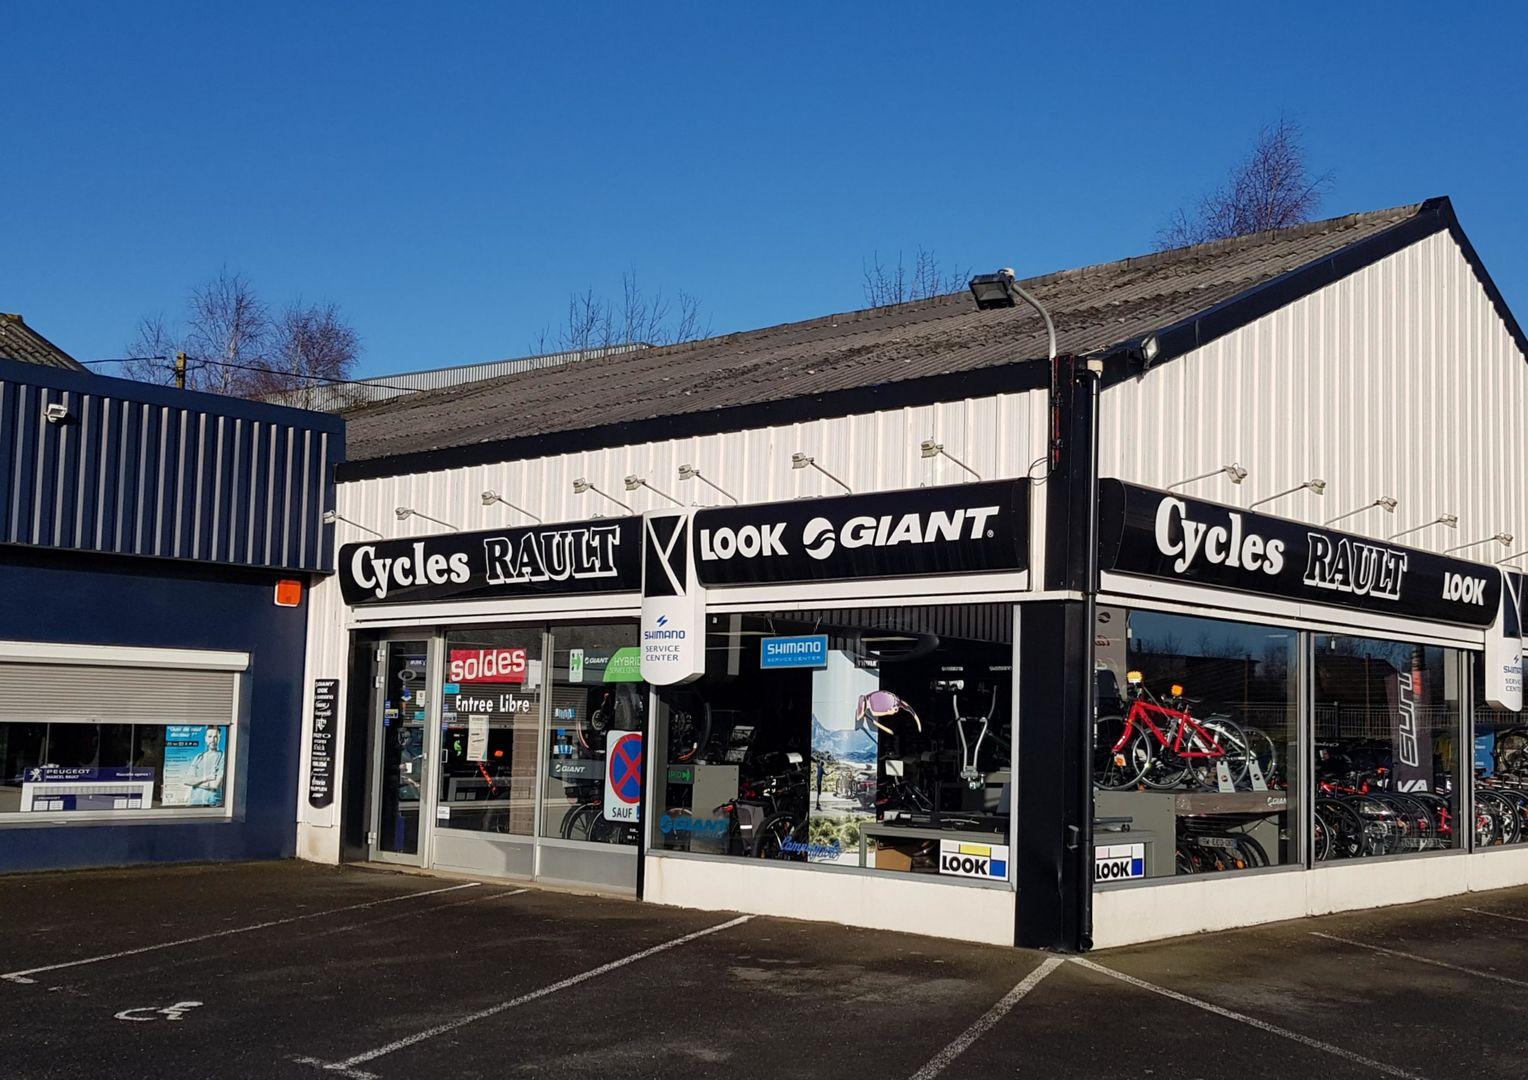 Plaintel_Facade-magasin-Cycles-Rault